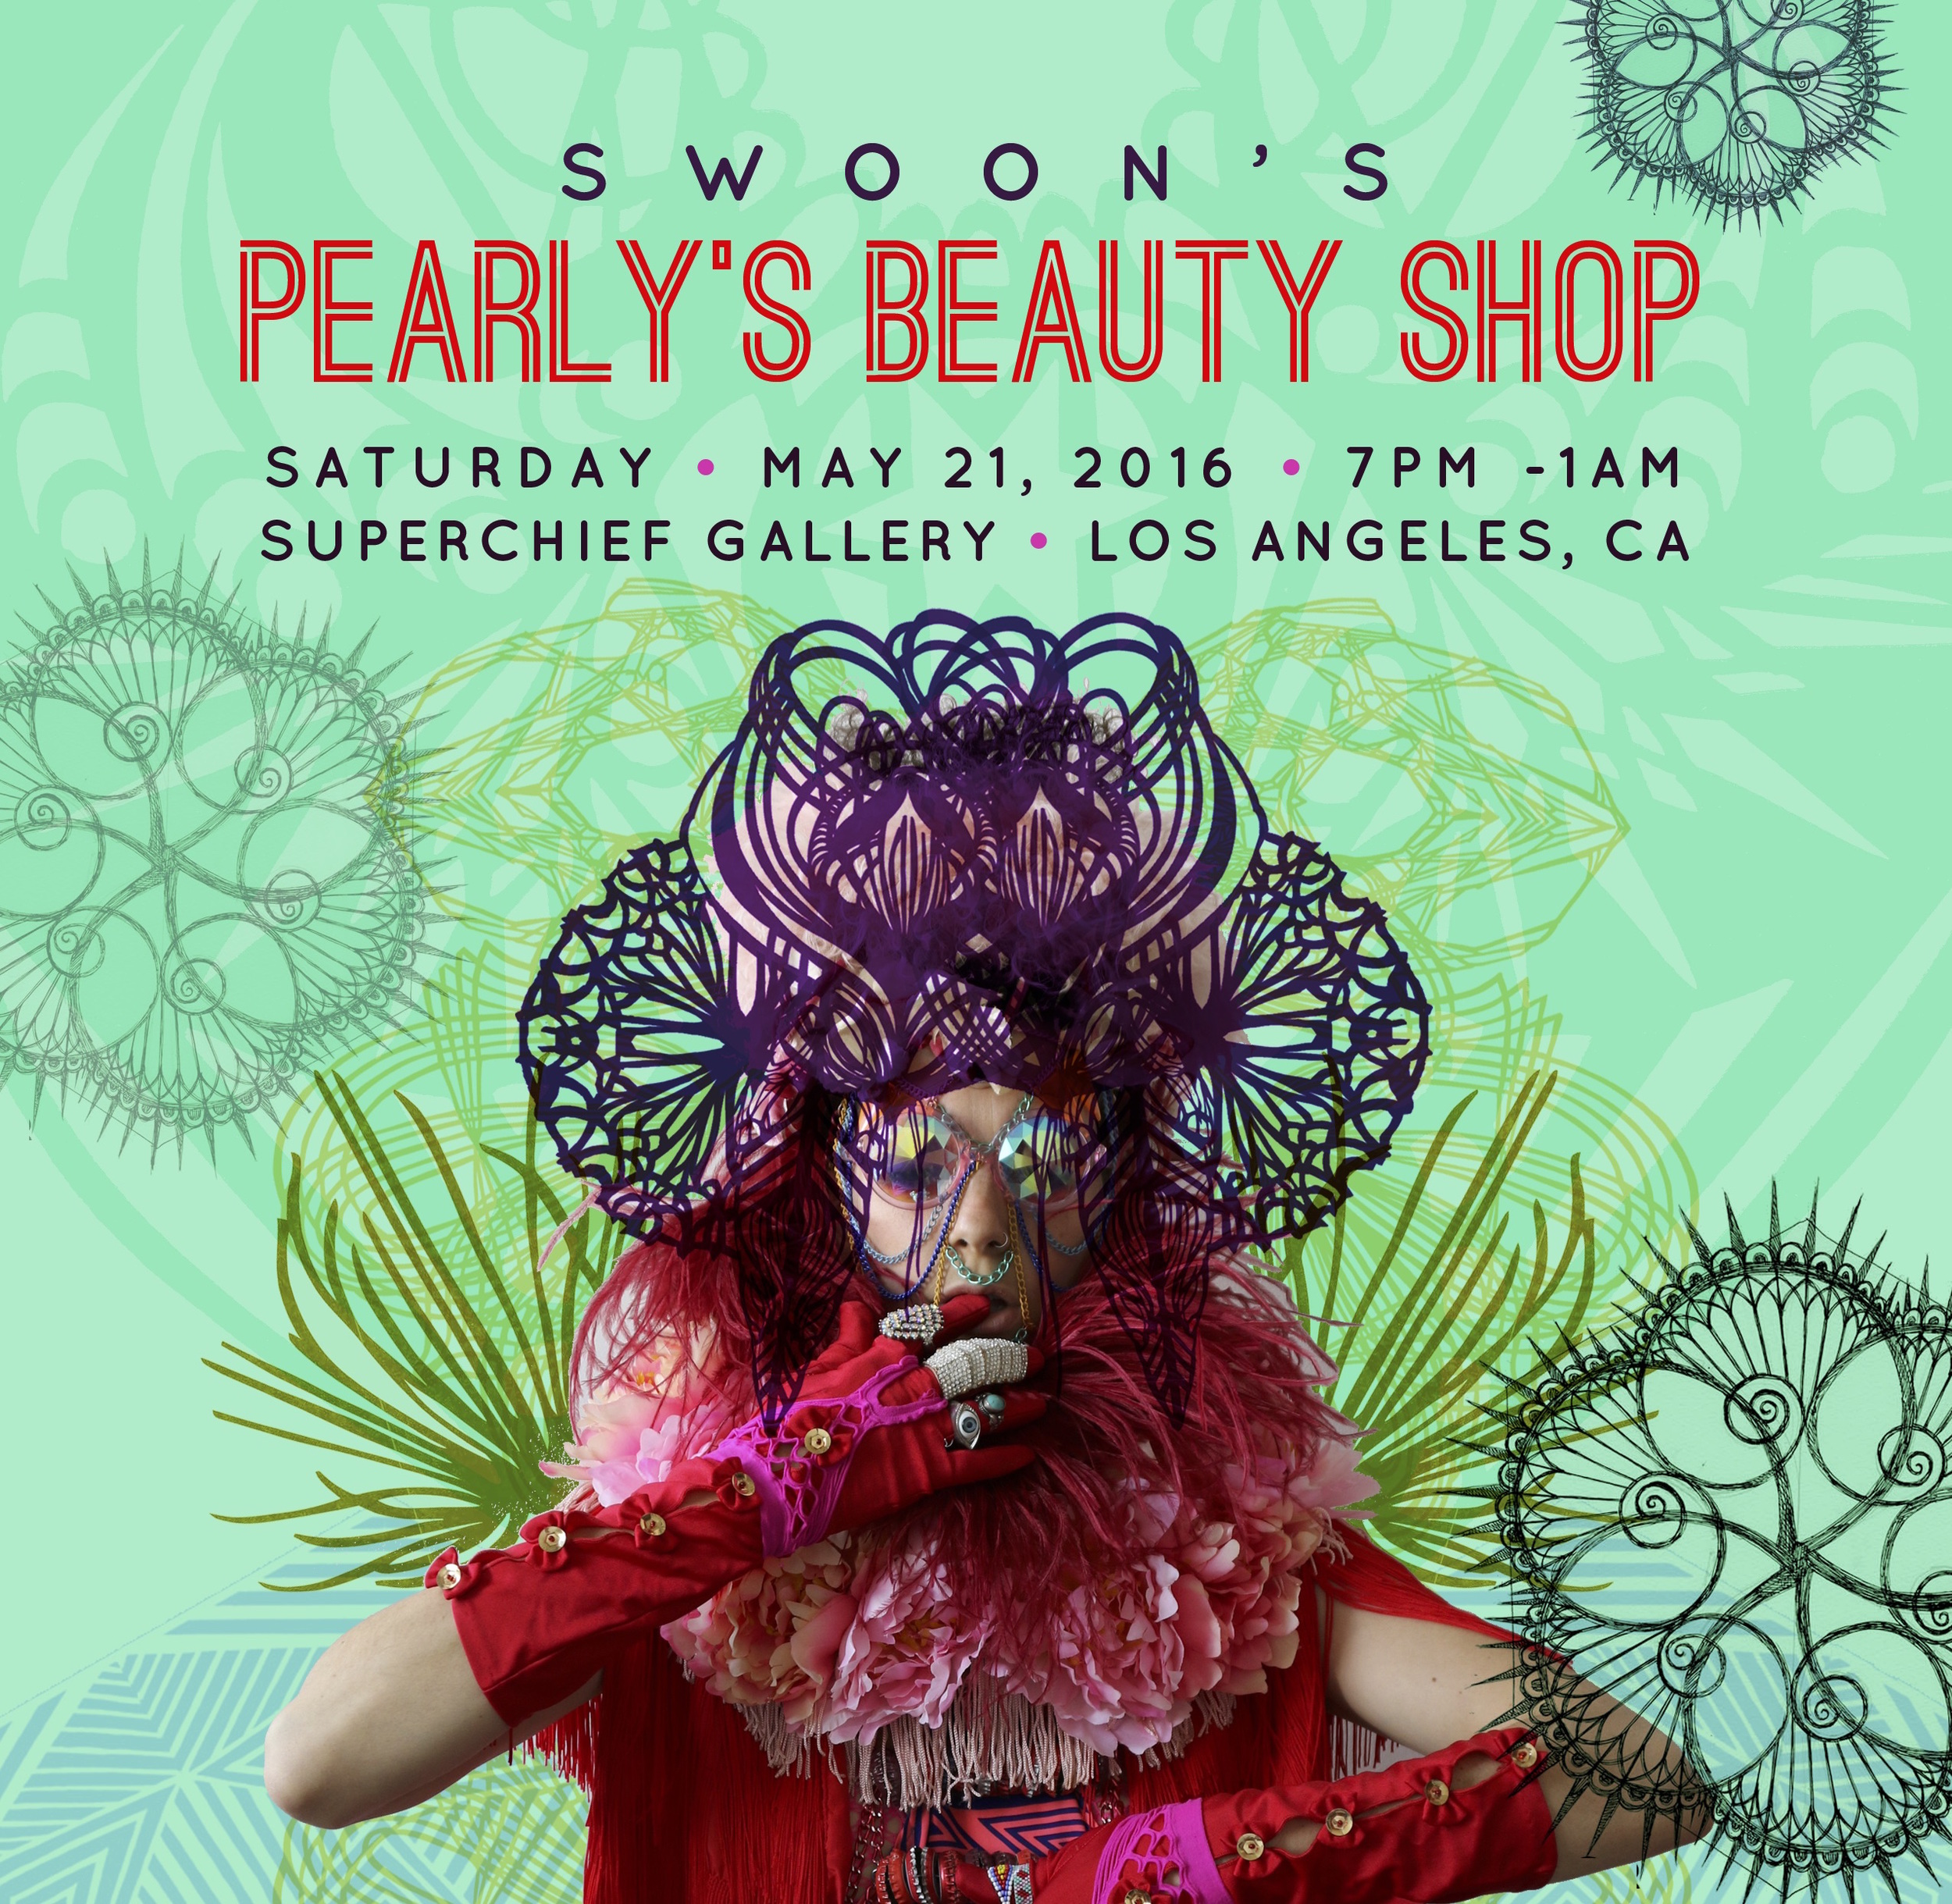 Pearly's Beauty Shop promo.jpg